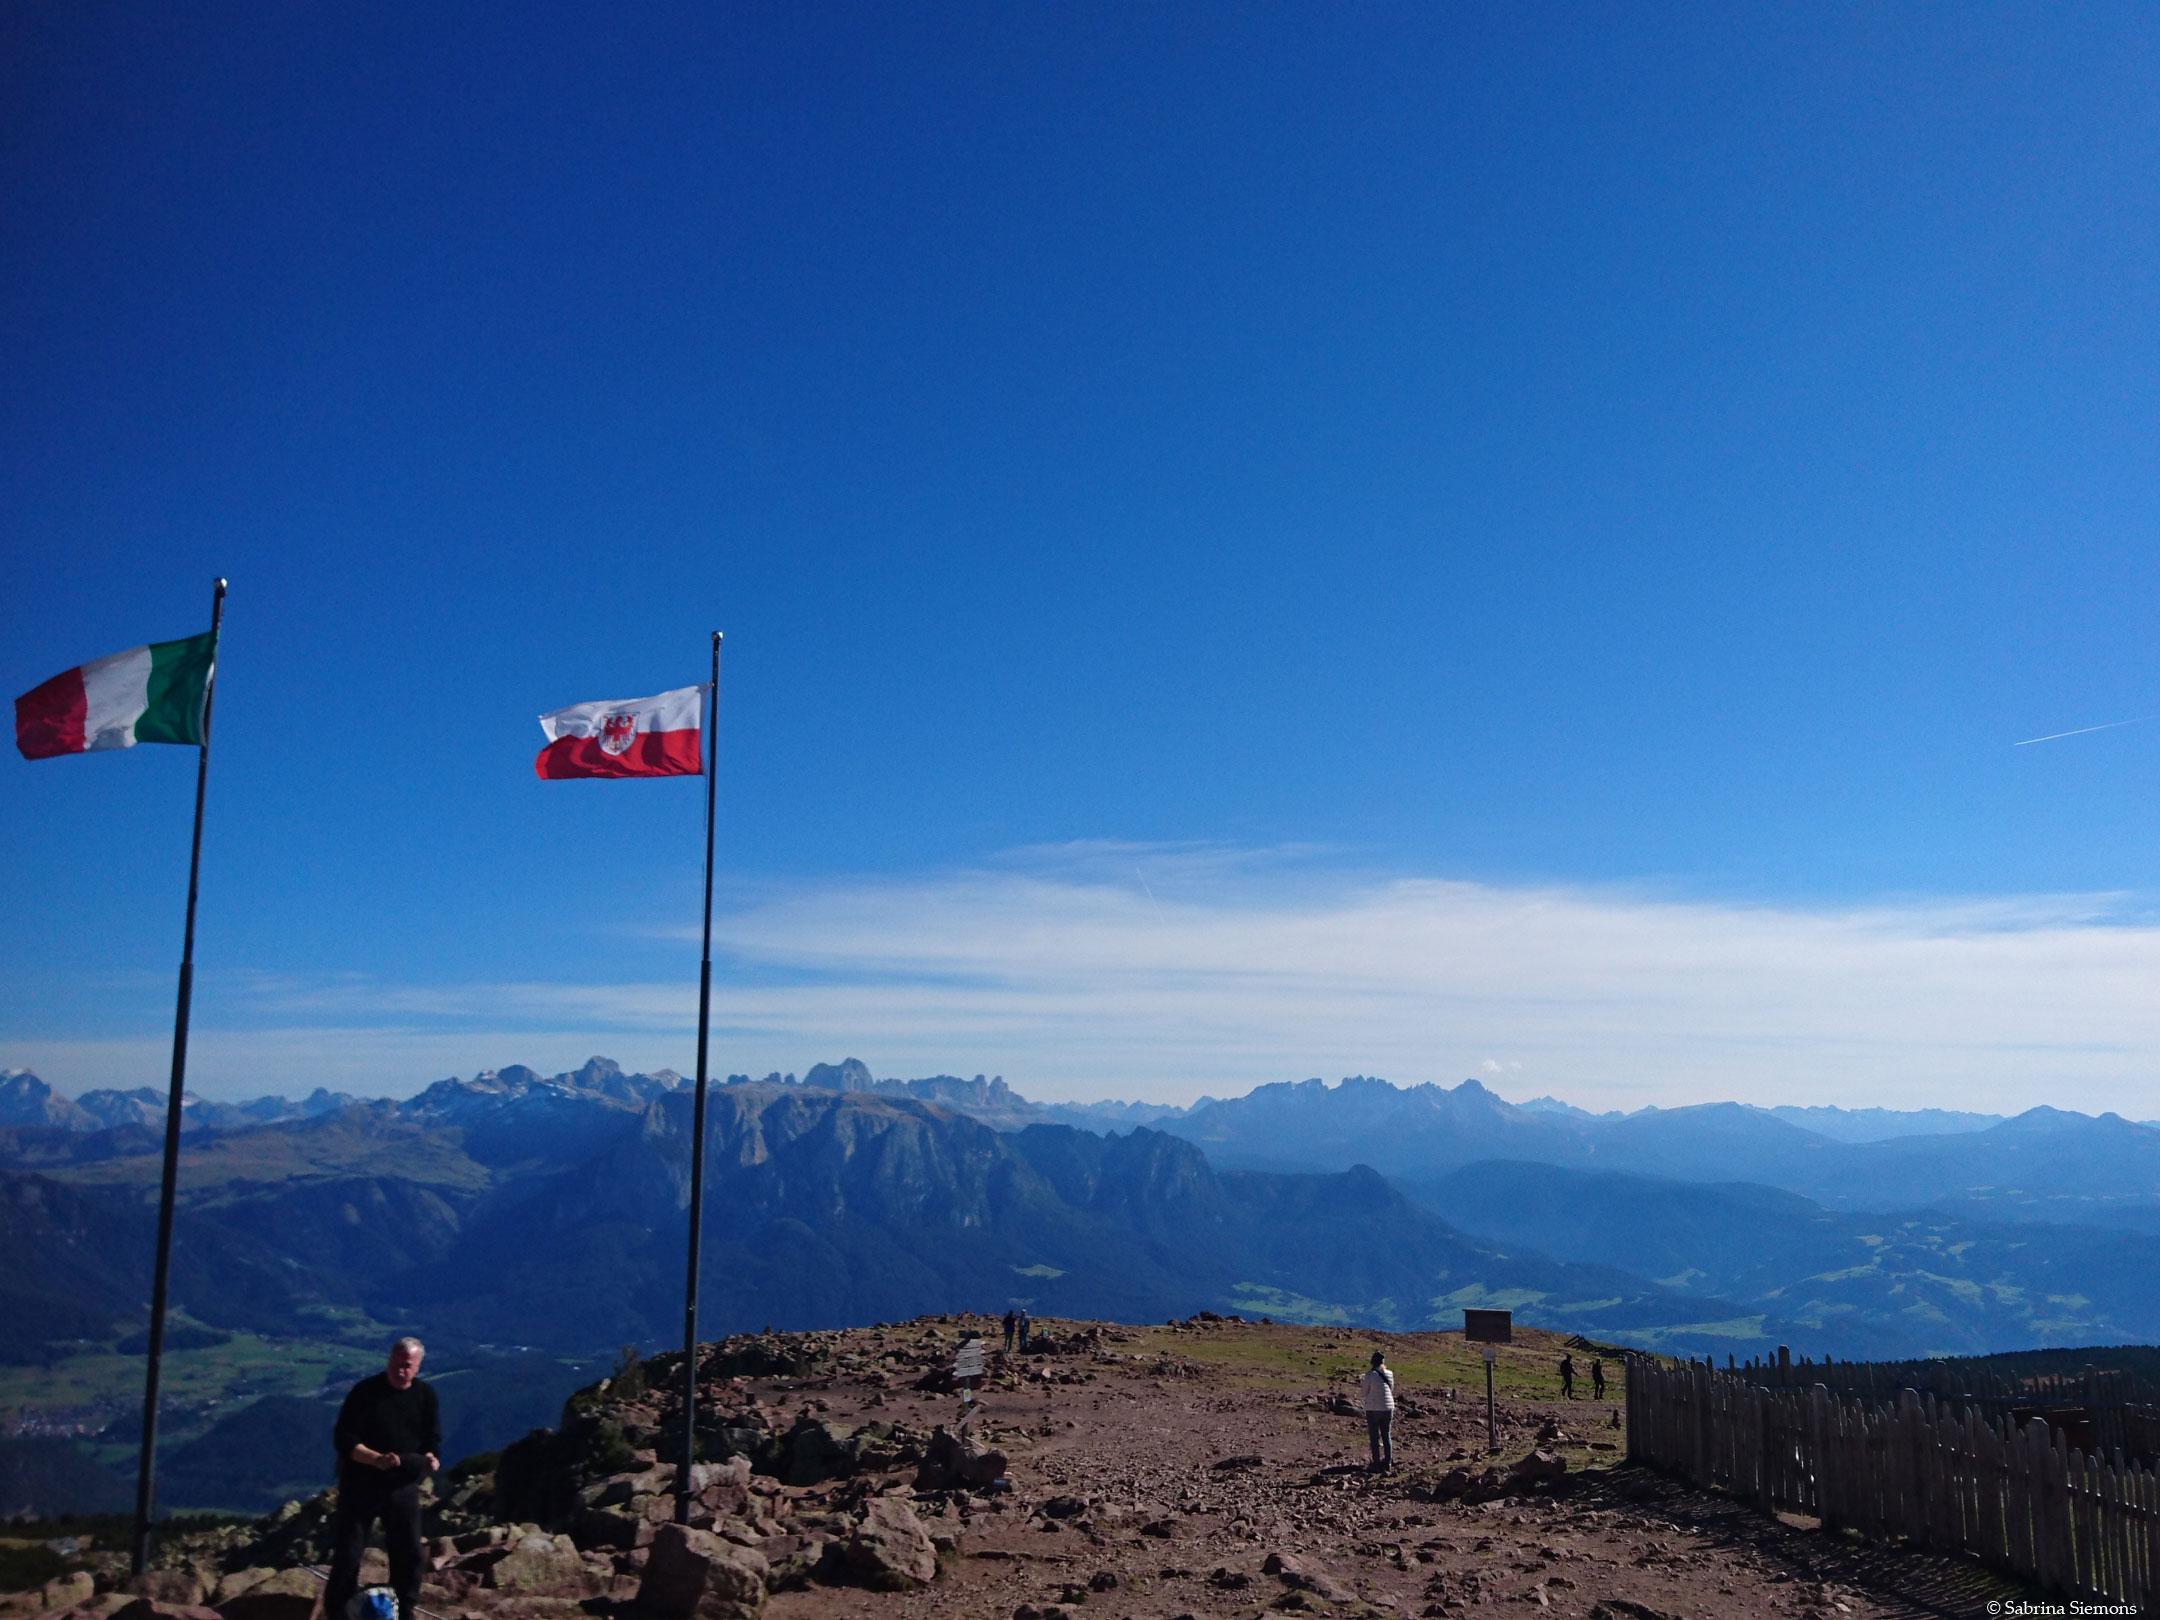 Wheelchair-Tours-Wheelchair-Rittner-Horn-View-Horn-on-Dolomites